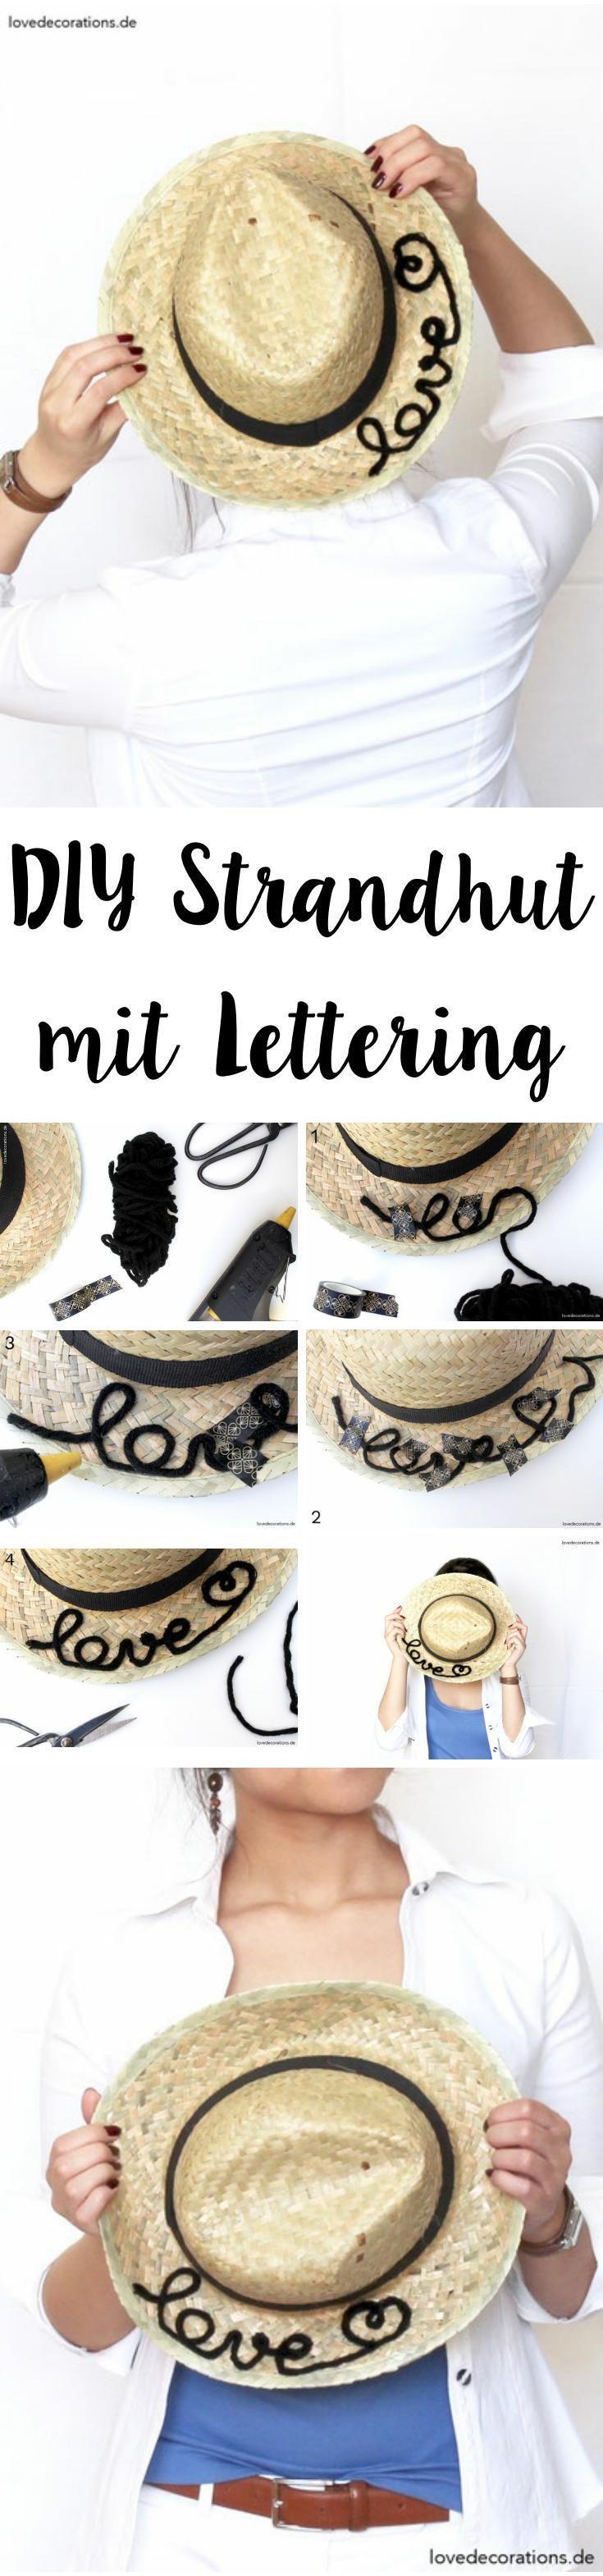 DIY Strandhut mit Lettering | DIY Sun Hat with Lettering